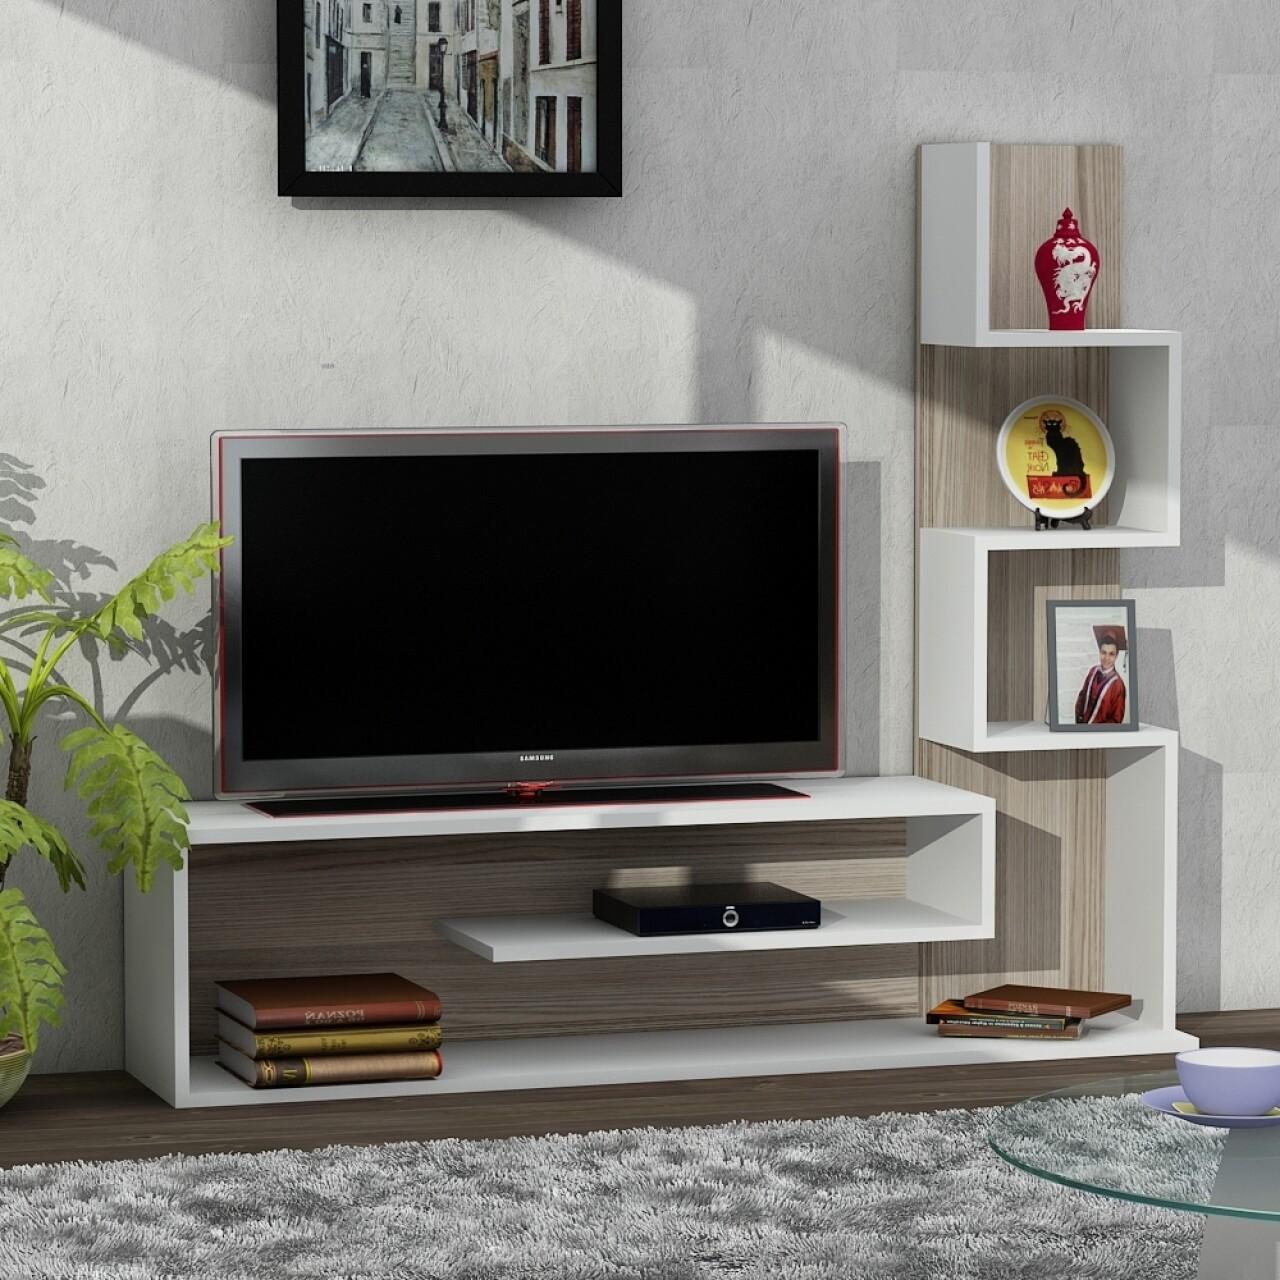 Comoda TV cu raft, Wooden Art, Metehan White Cordoba, 149.5x120.8x29.5 cm